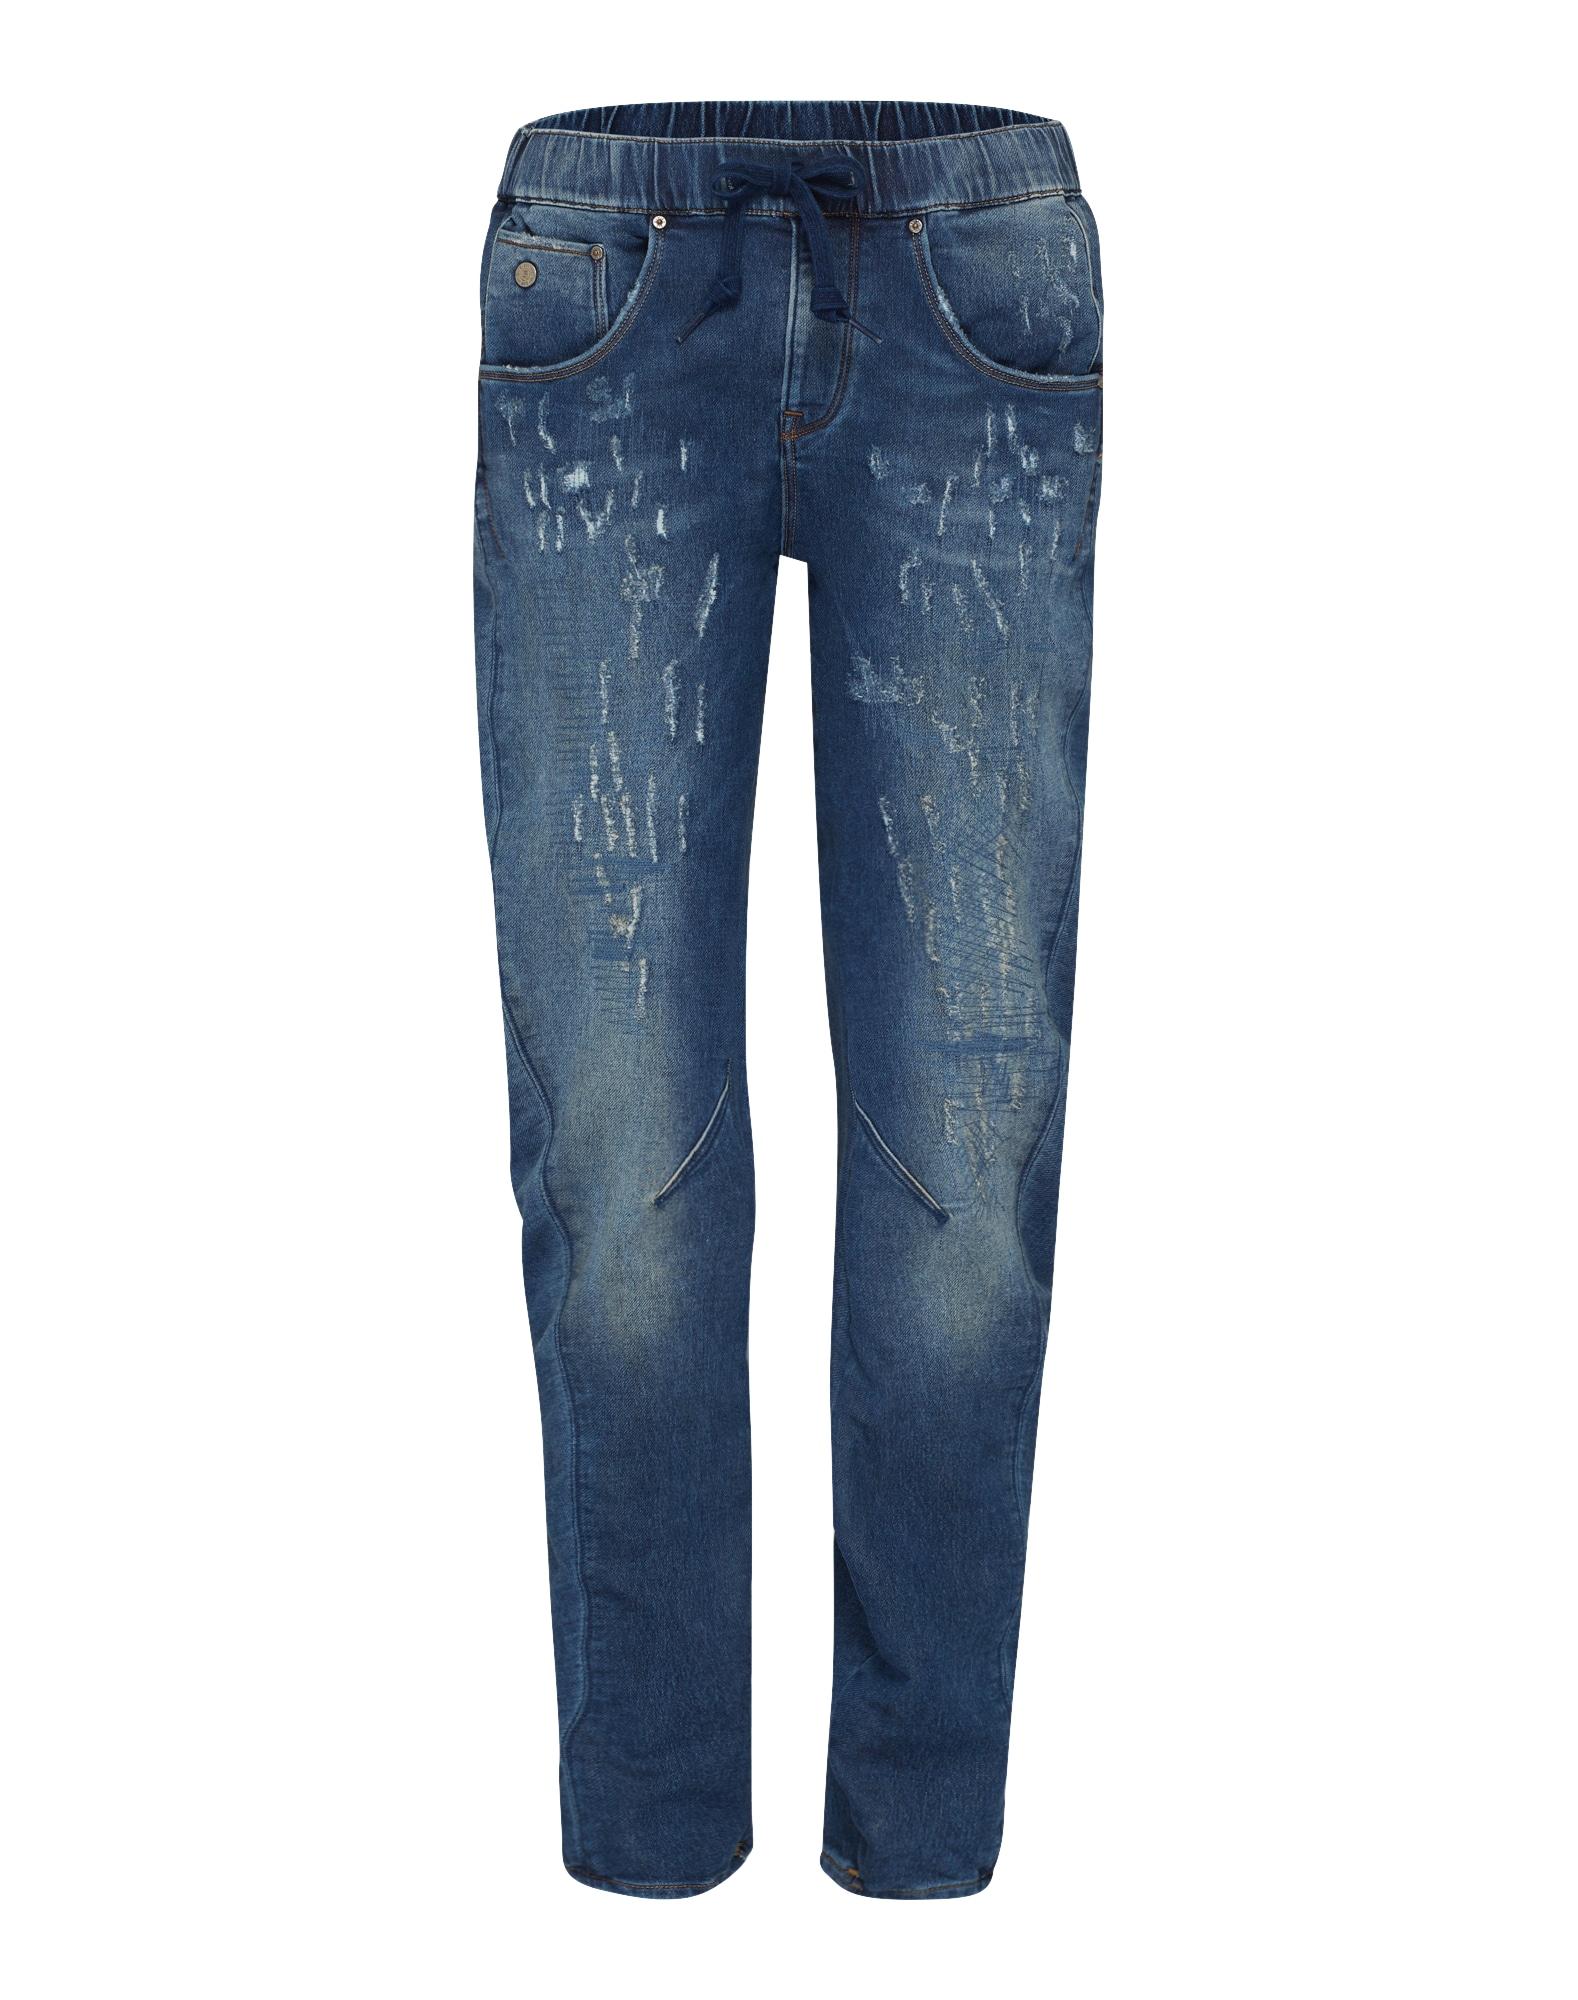 G-STAR RAW Dames Jeans Boyfriend blue denim